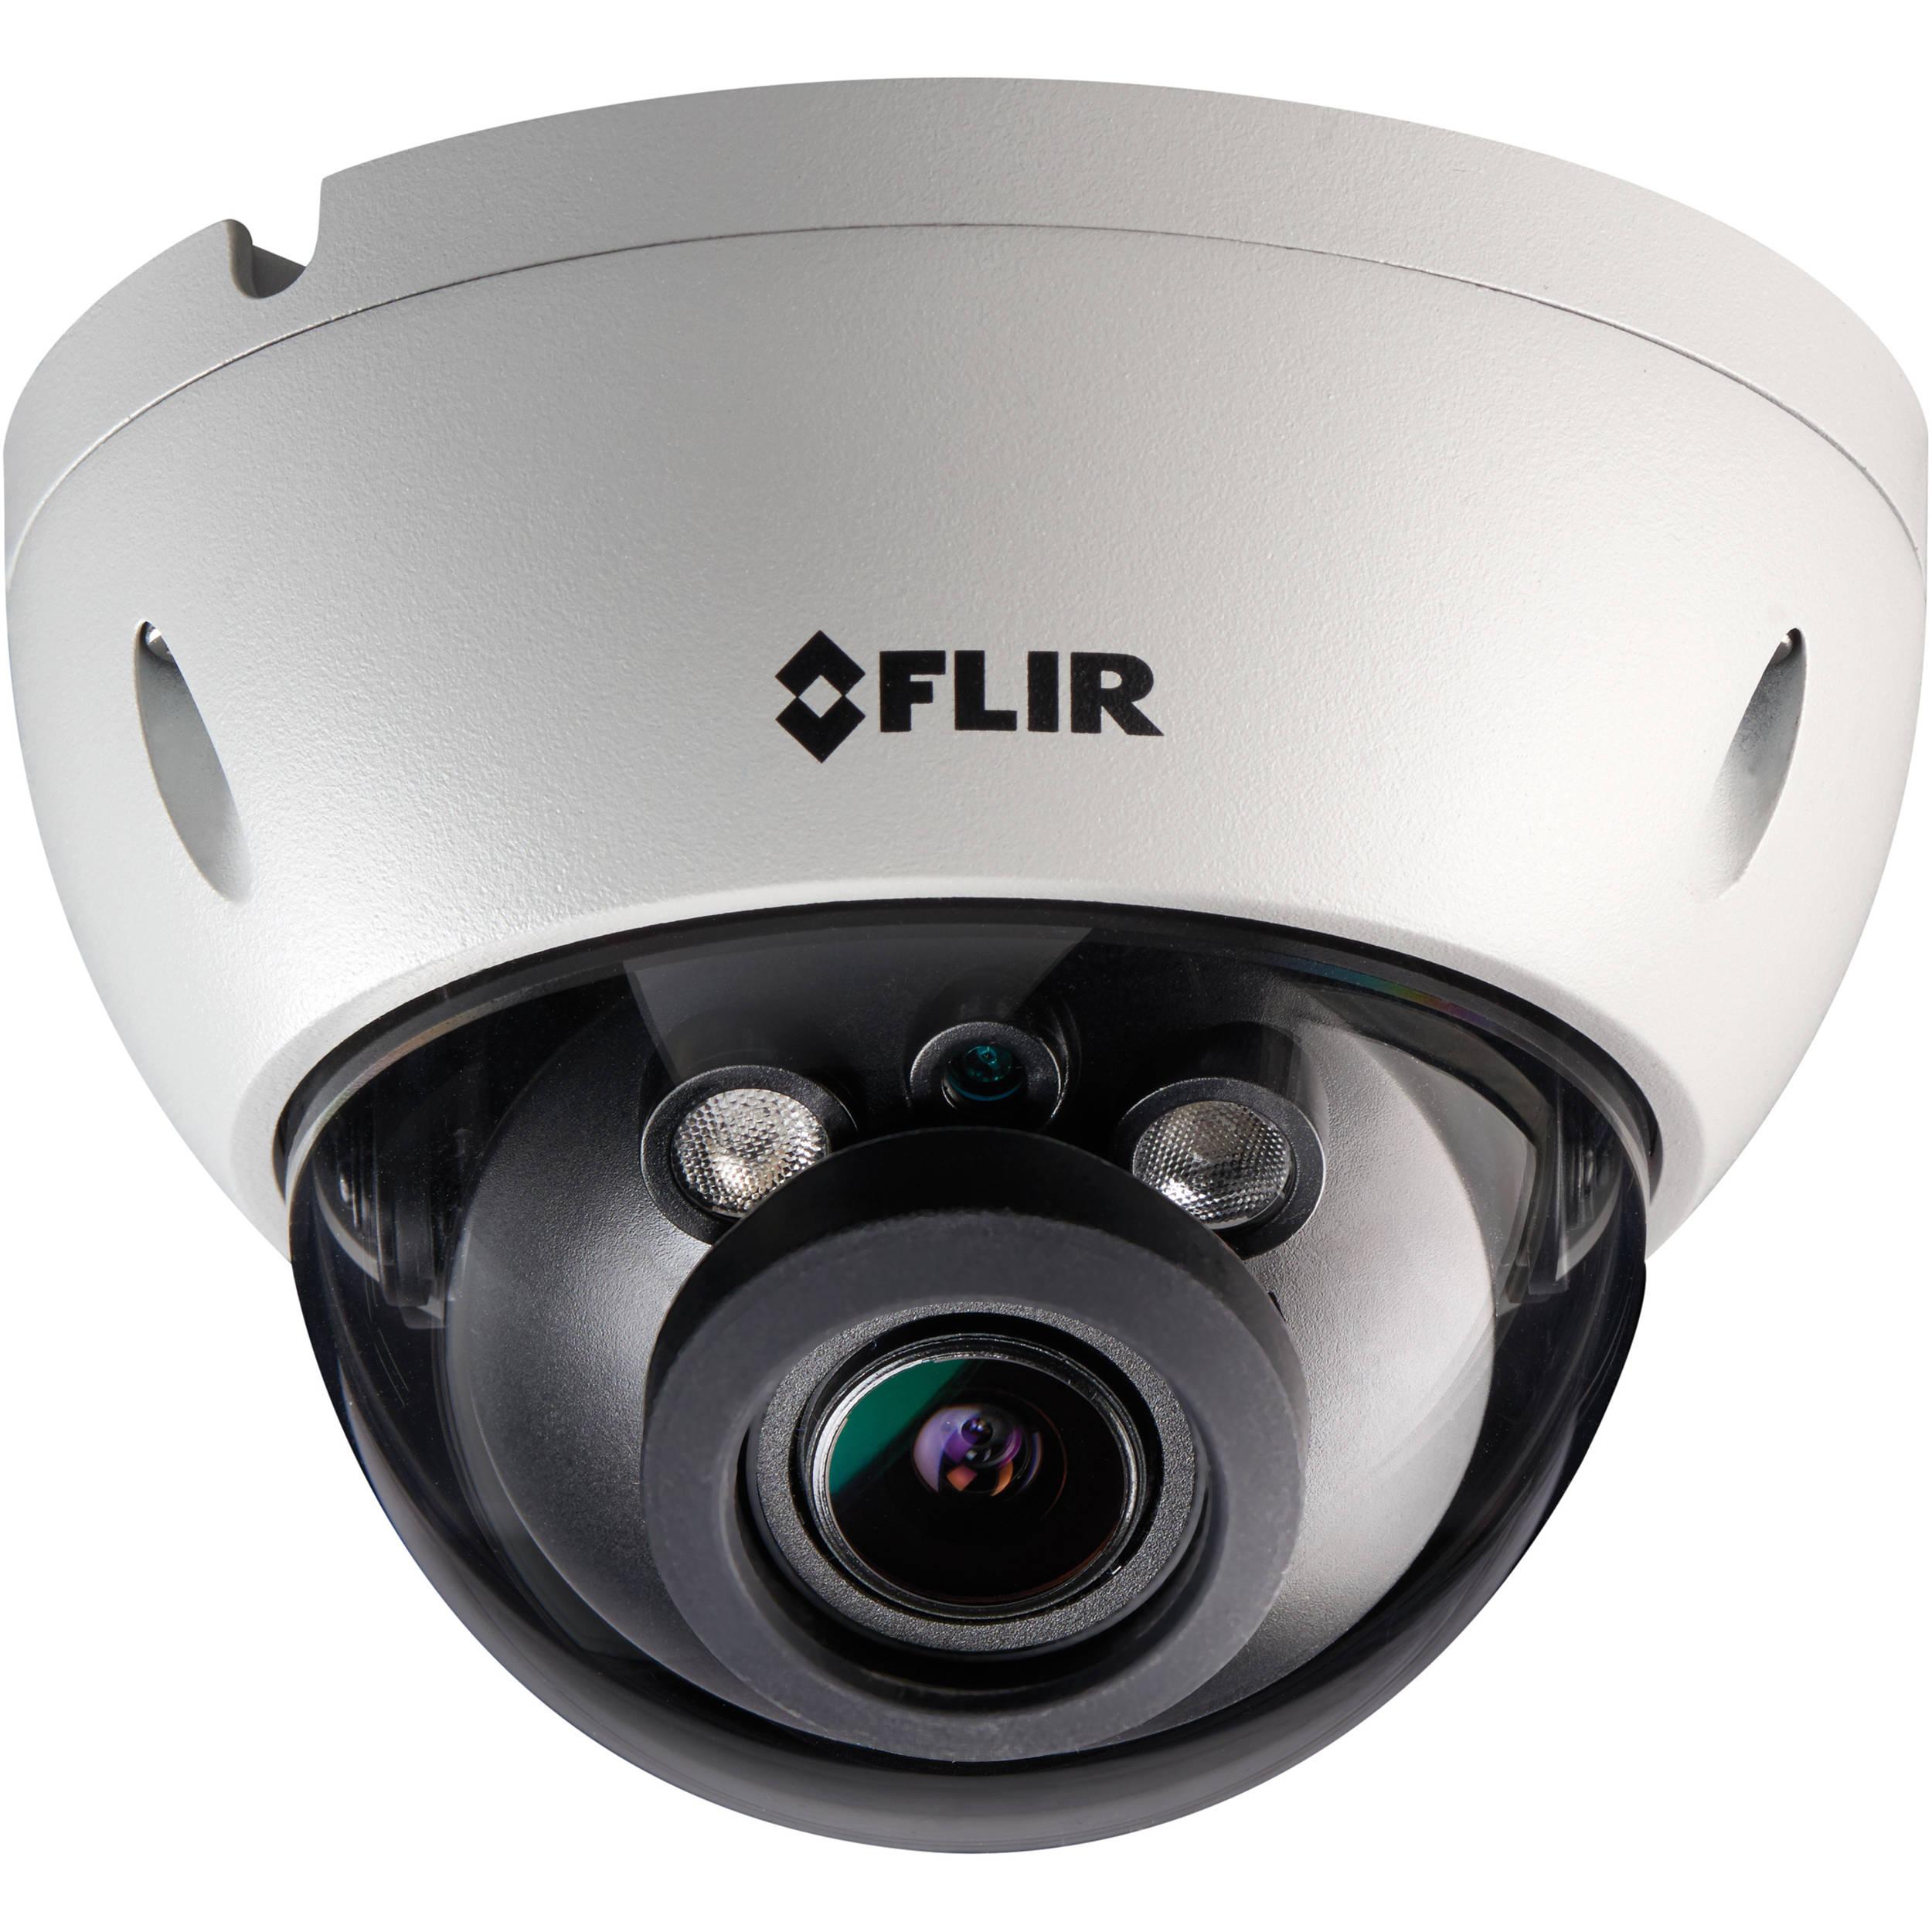 flir n237ve 3mp 1080p ir vandal dome ip camera with 2 8 n237ve. Black Bedroom Furniture Sets. Home Design Ideas